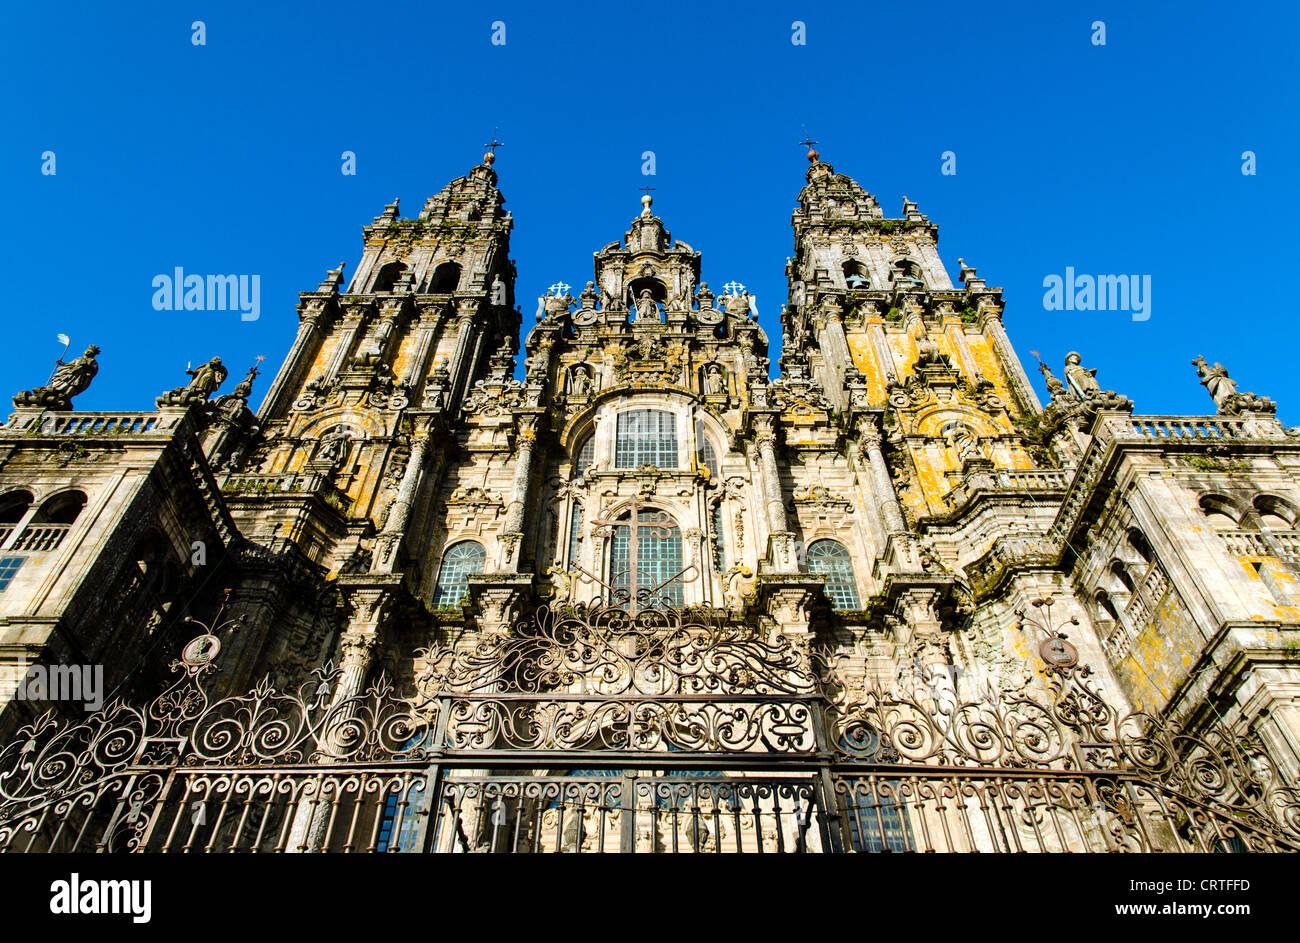 Santiago de Compostela Cathedral North Spain Europe - Stock Image